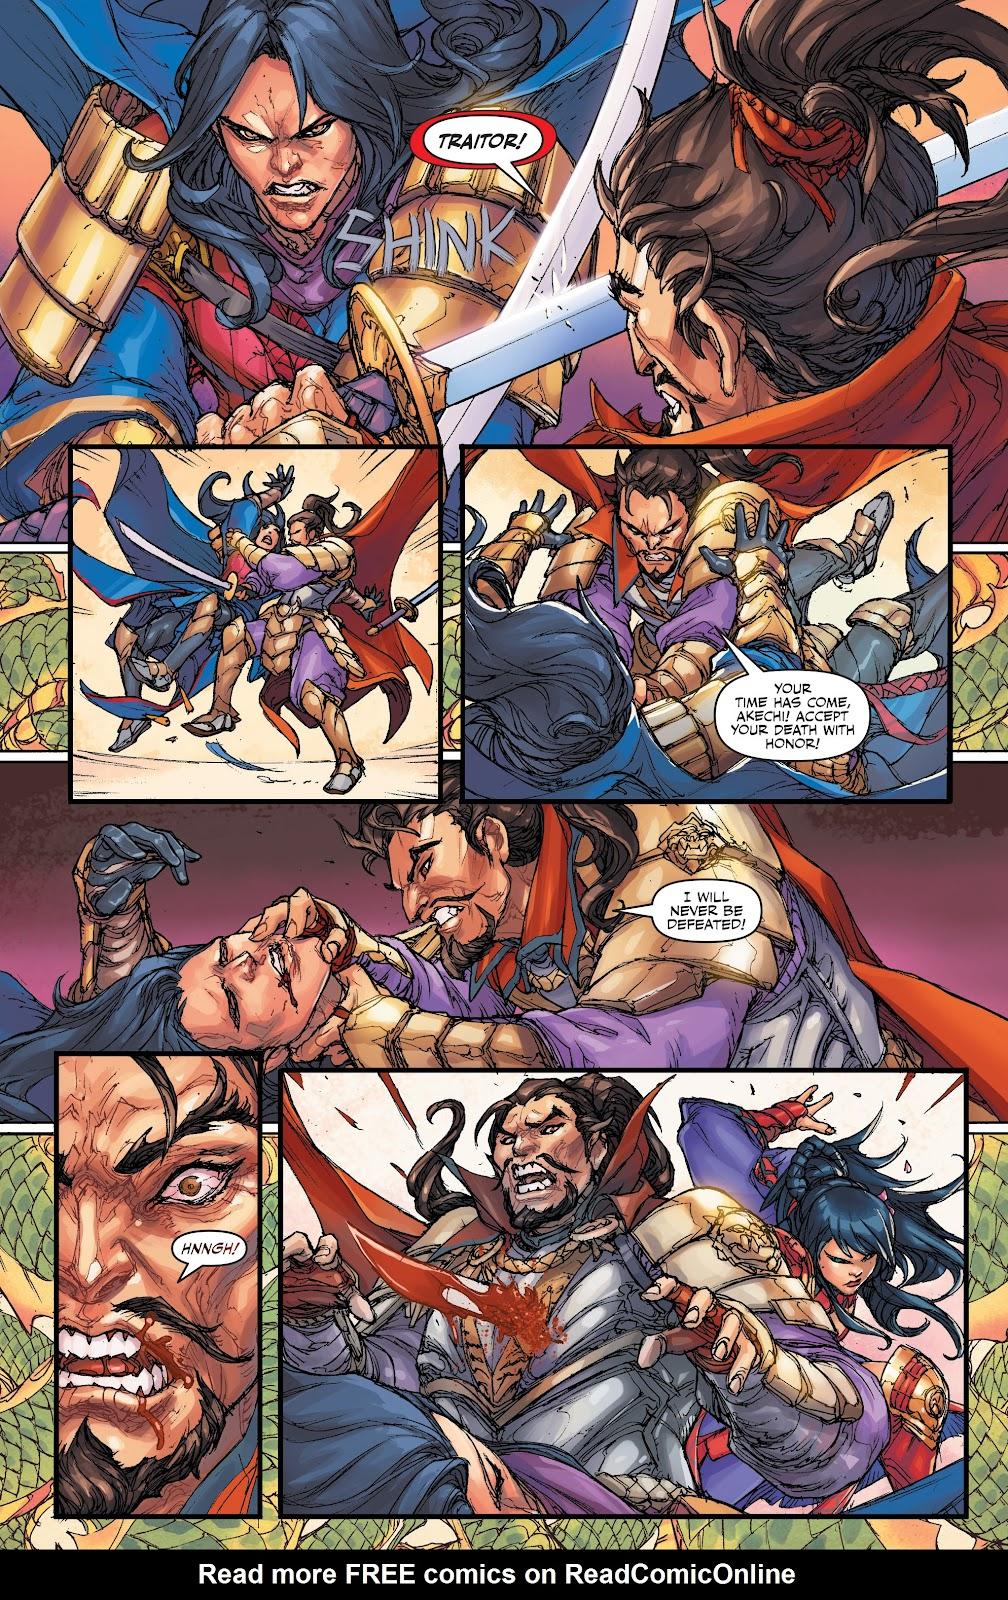 Read online Oniba: Swords of the Demon comic -  Issue # Full - 14